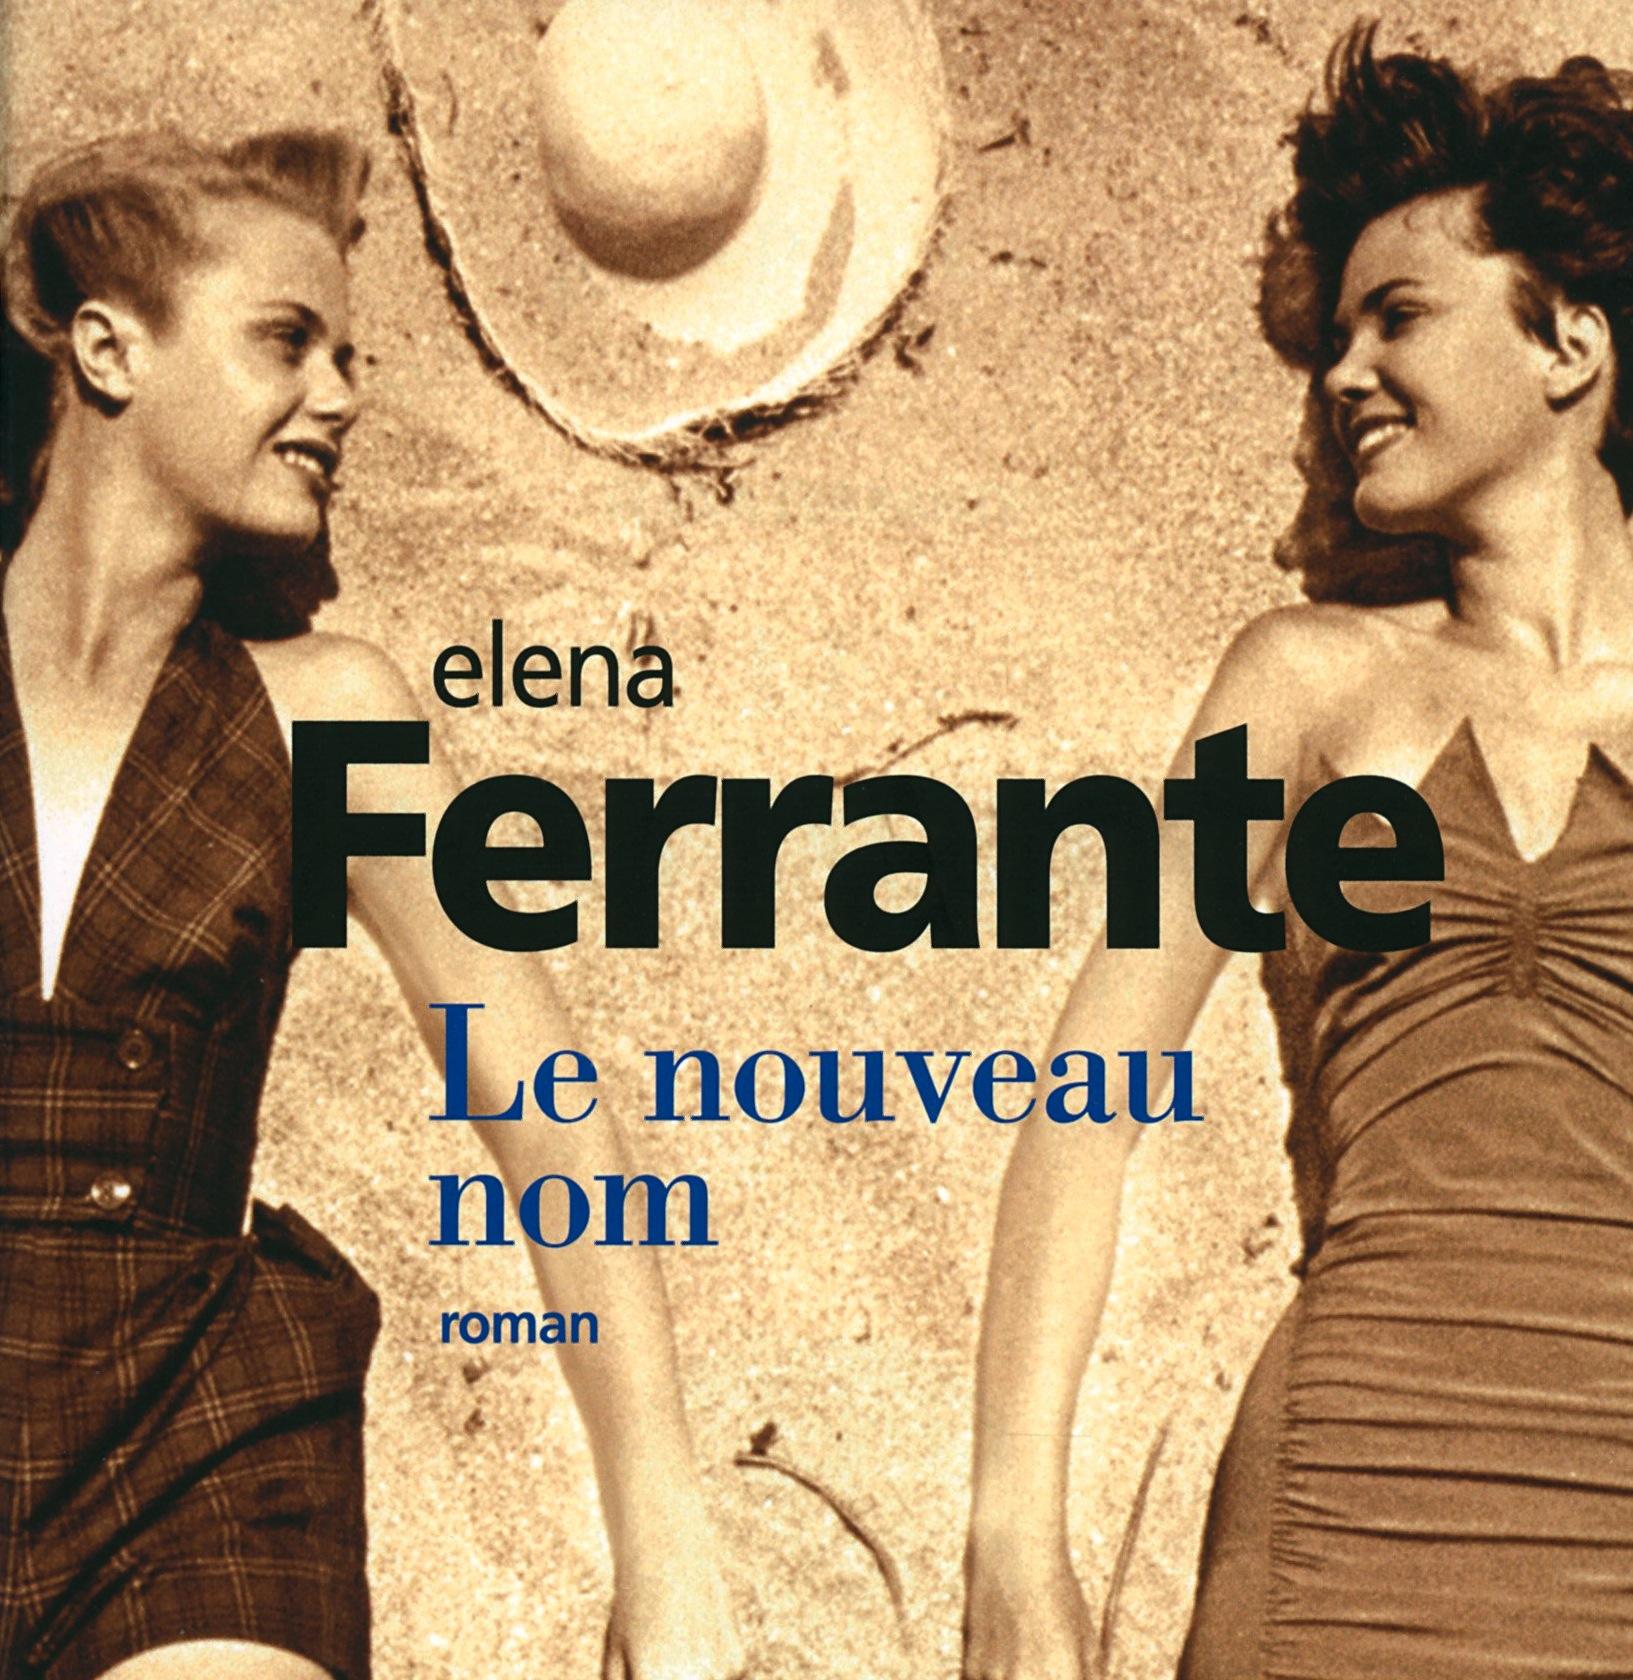 Elena Ferrante dévoilée !